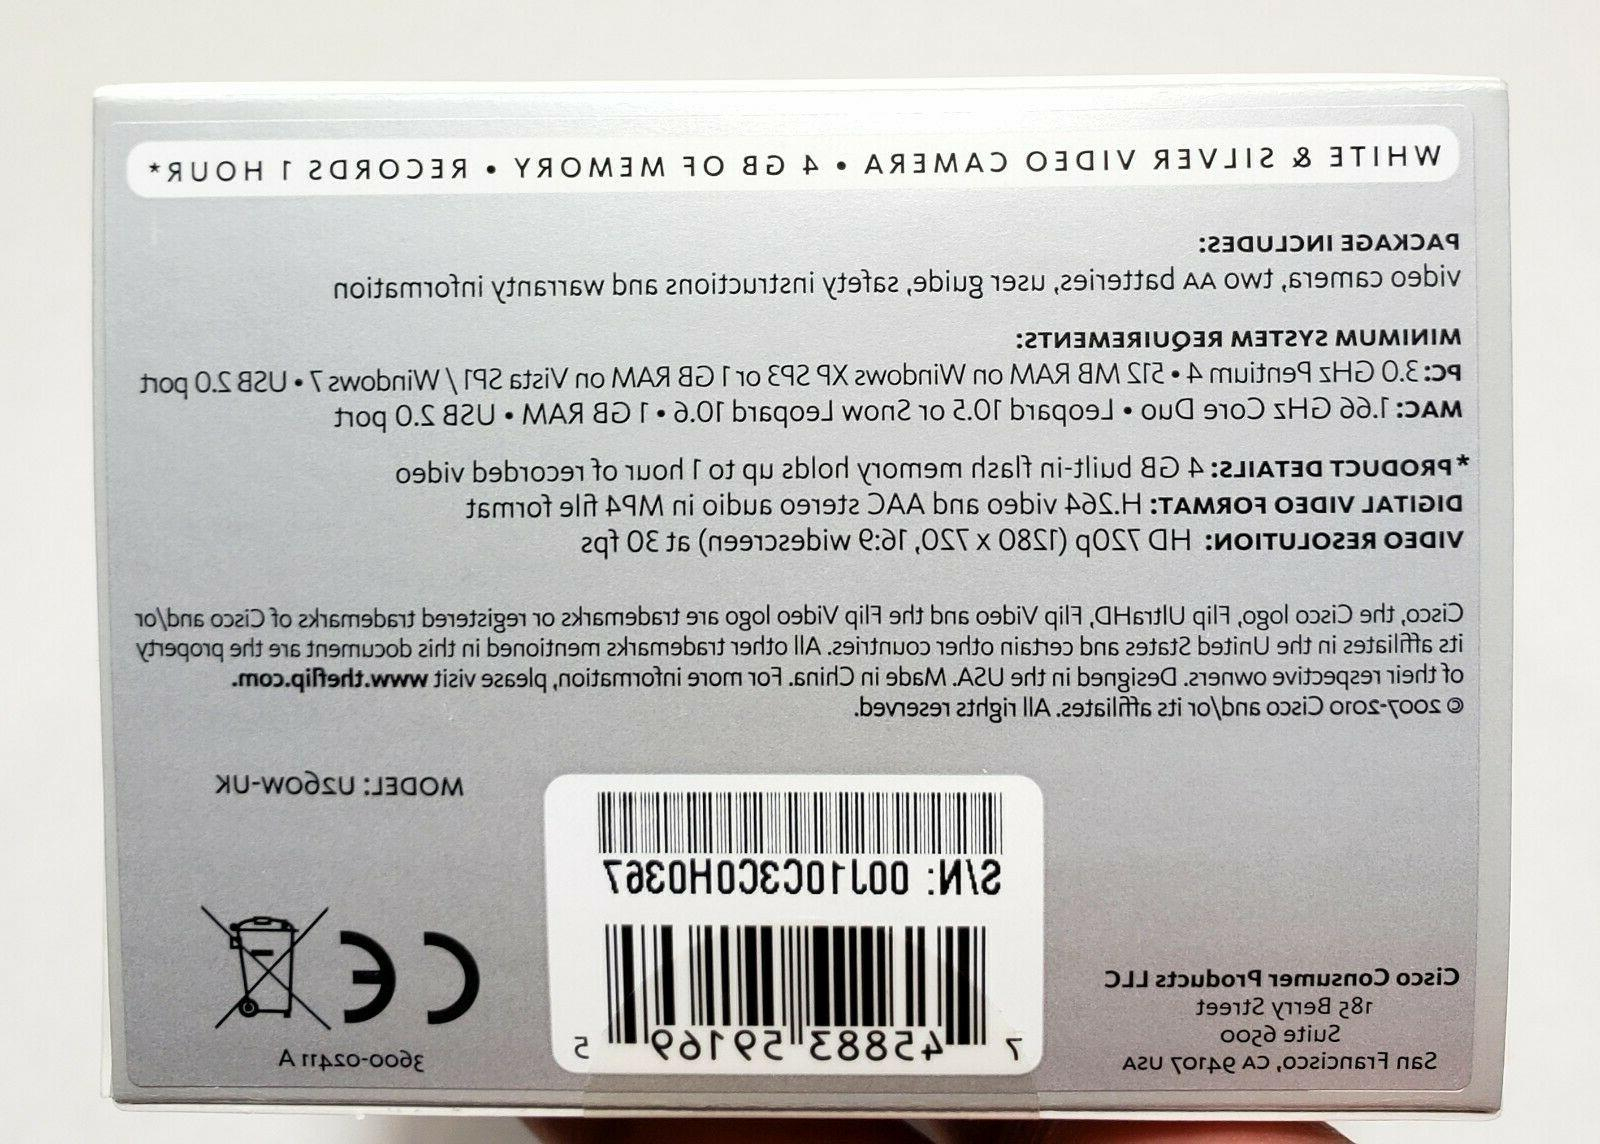 Cisco UltraHD Video Camera Camcorder U260W